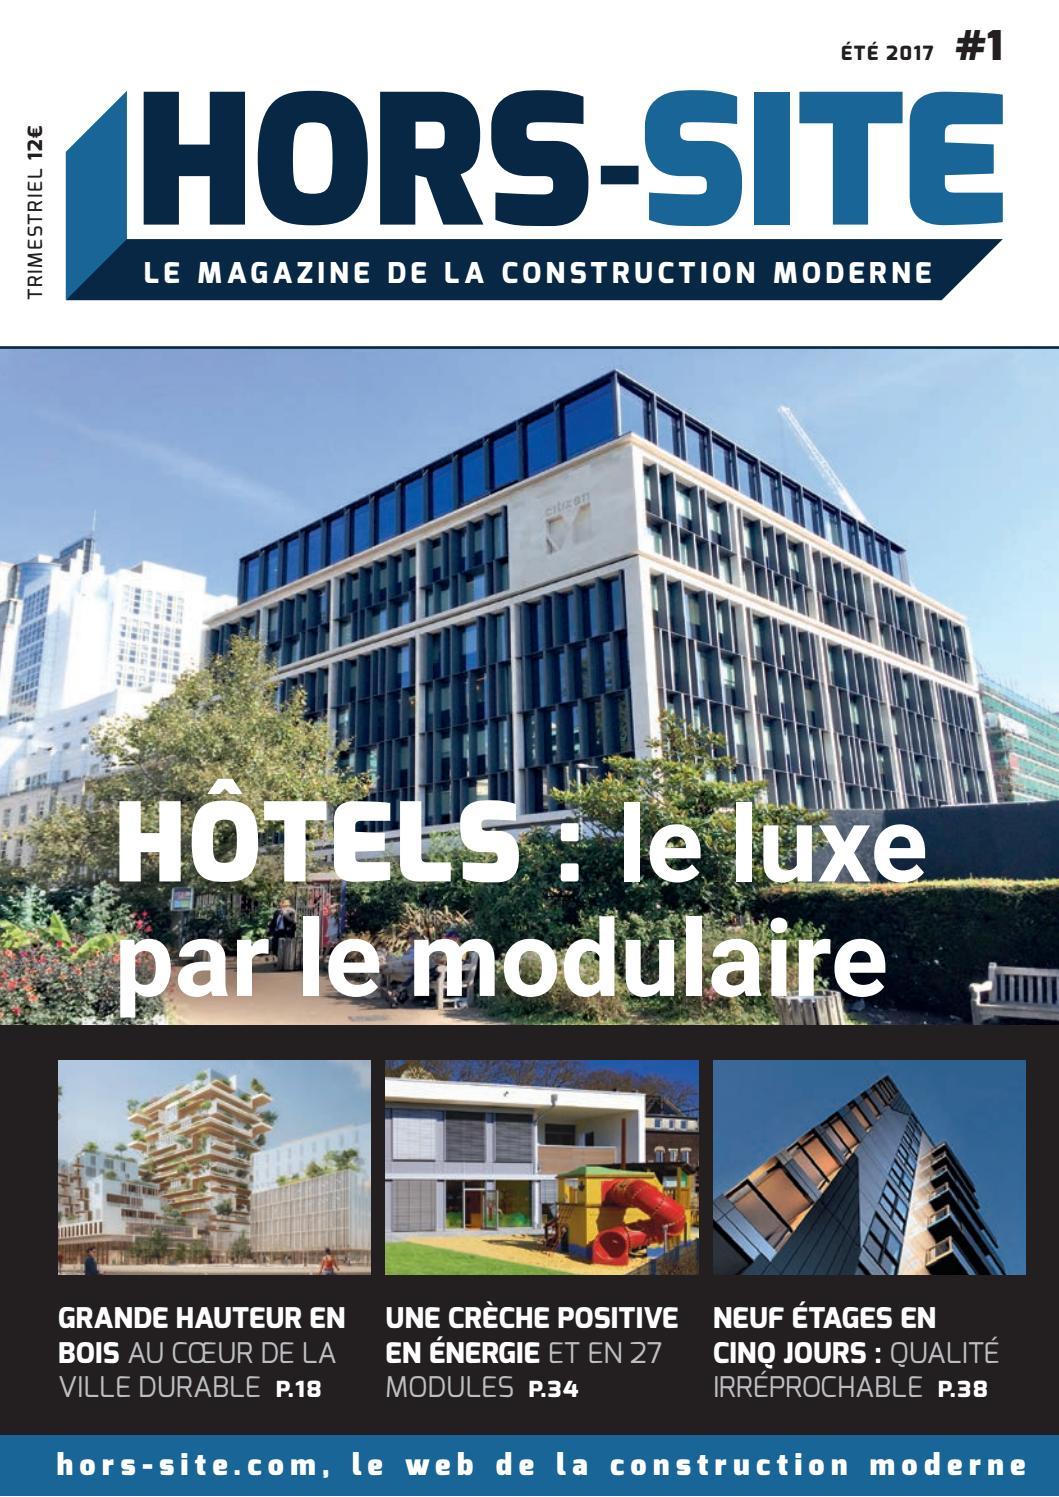 Escalier Modulaire Pas Cher magazine hors-site #1hors-site magazine - issuu